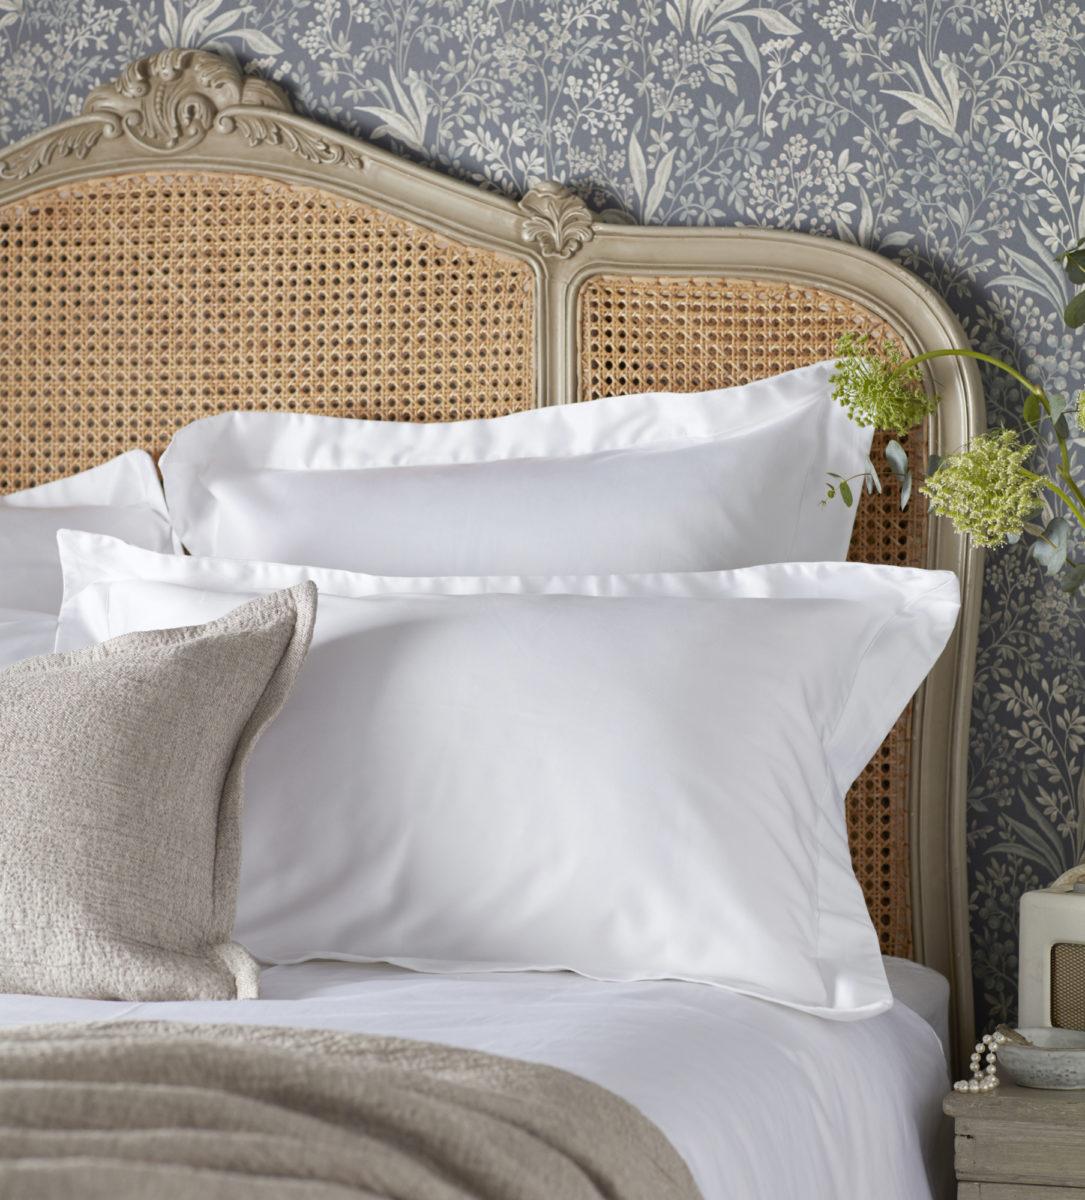 600 Thread Count Luxury White Oxford Pillowcase | Secret Linen Store